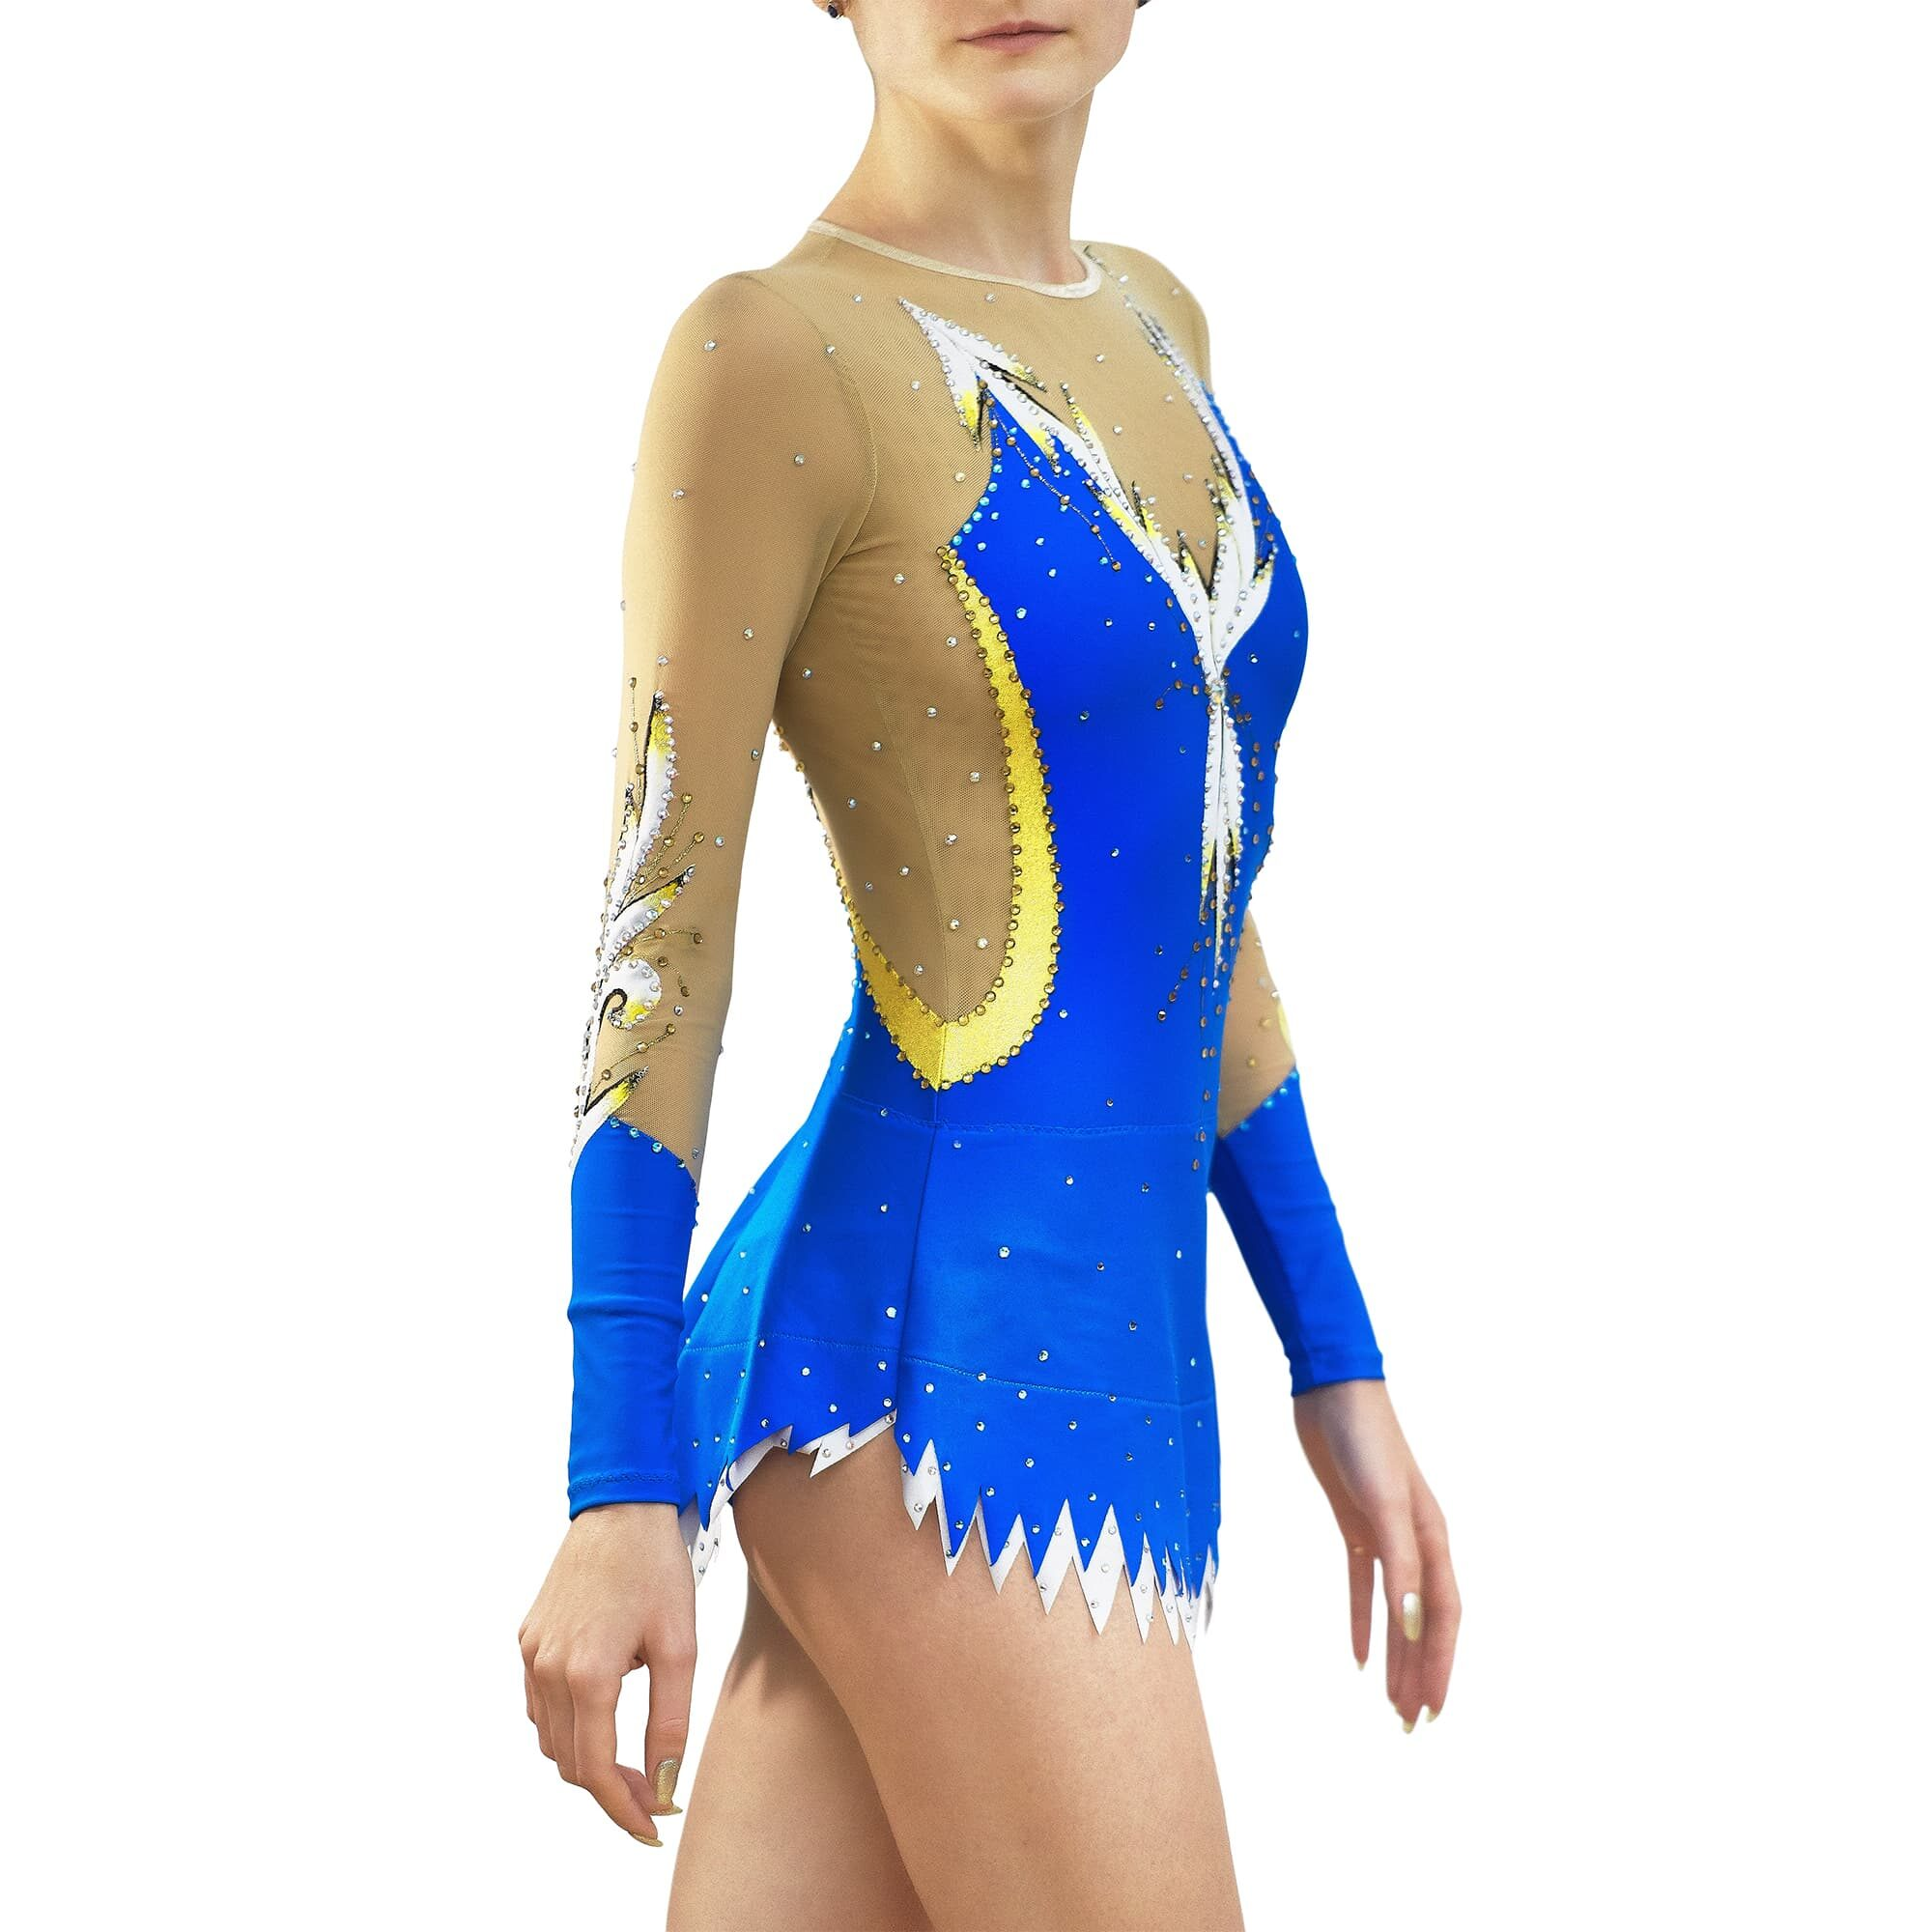 Royal blue, white, gold, mesh Rhythmic Gymnastics Leotard 236 for competitions